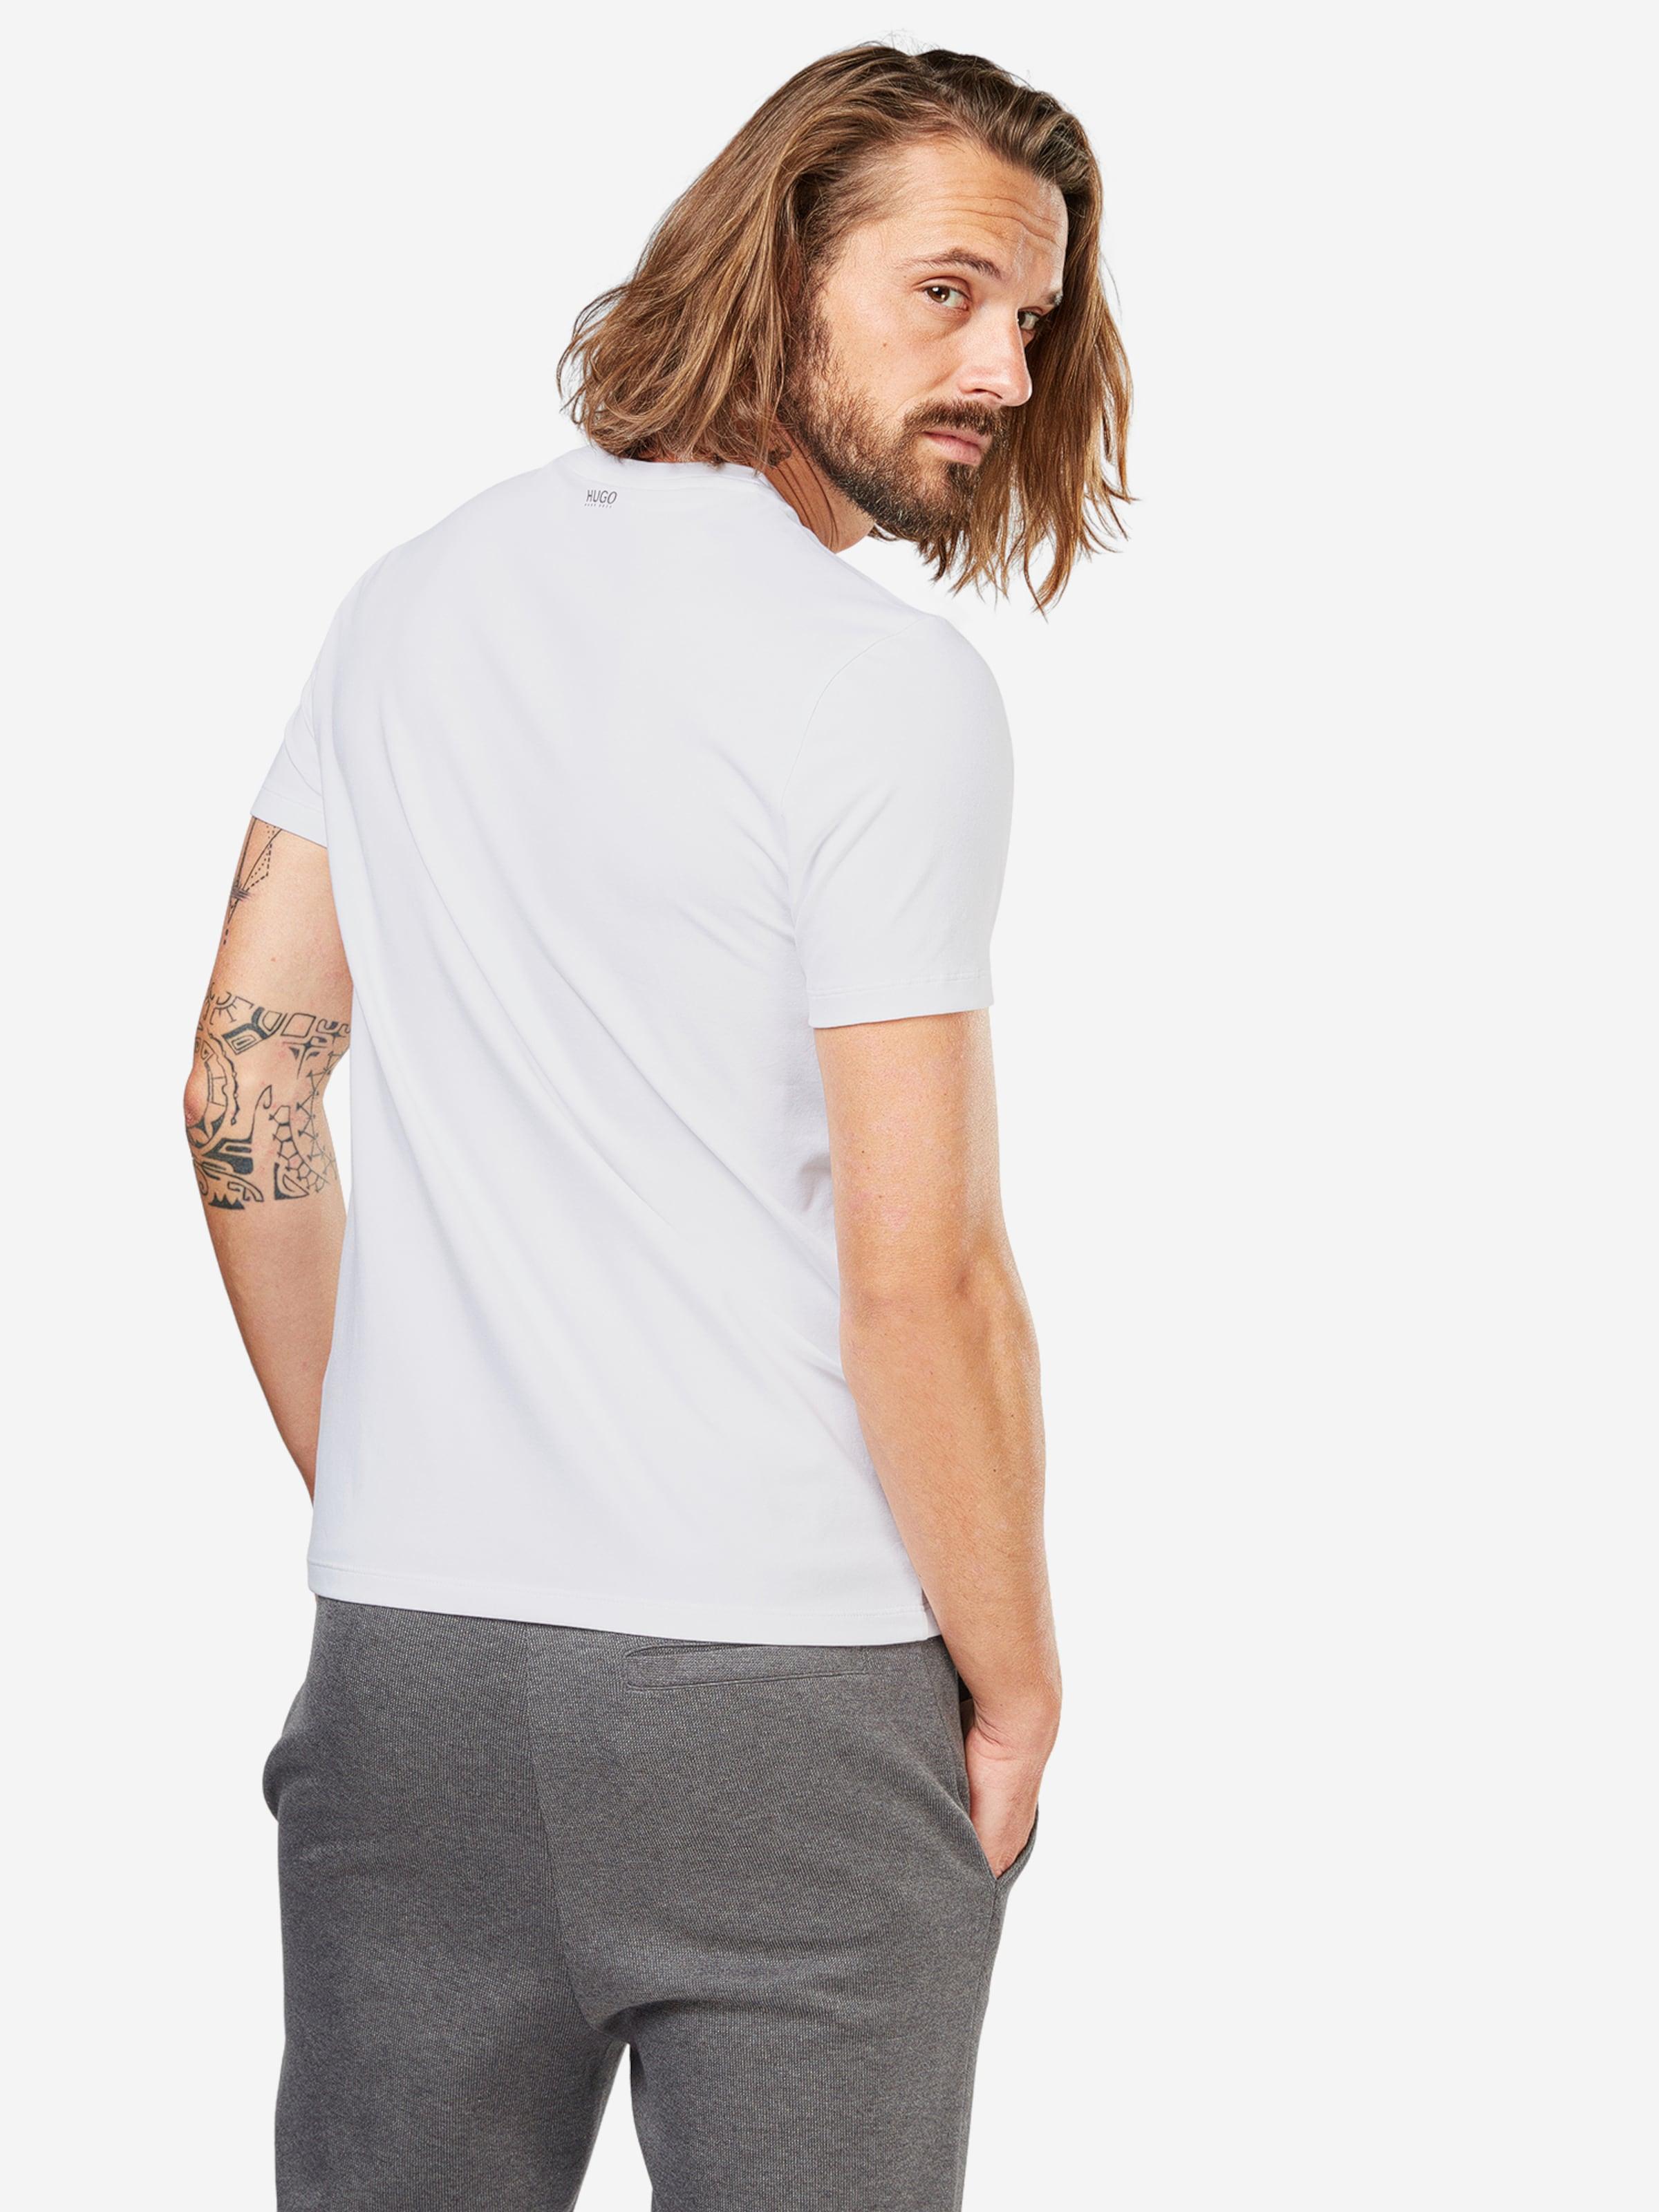 Weiß T shirt Im In Hugo 'round' Doppelpack ymfb6gY7Iv